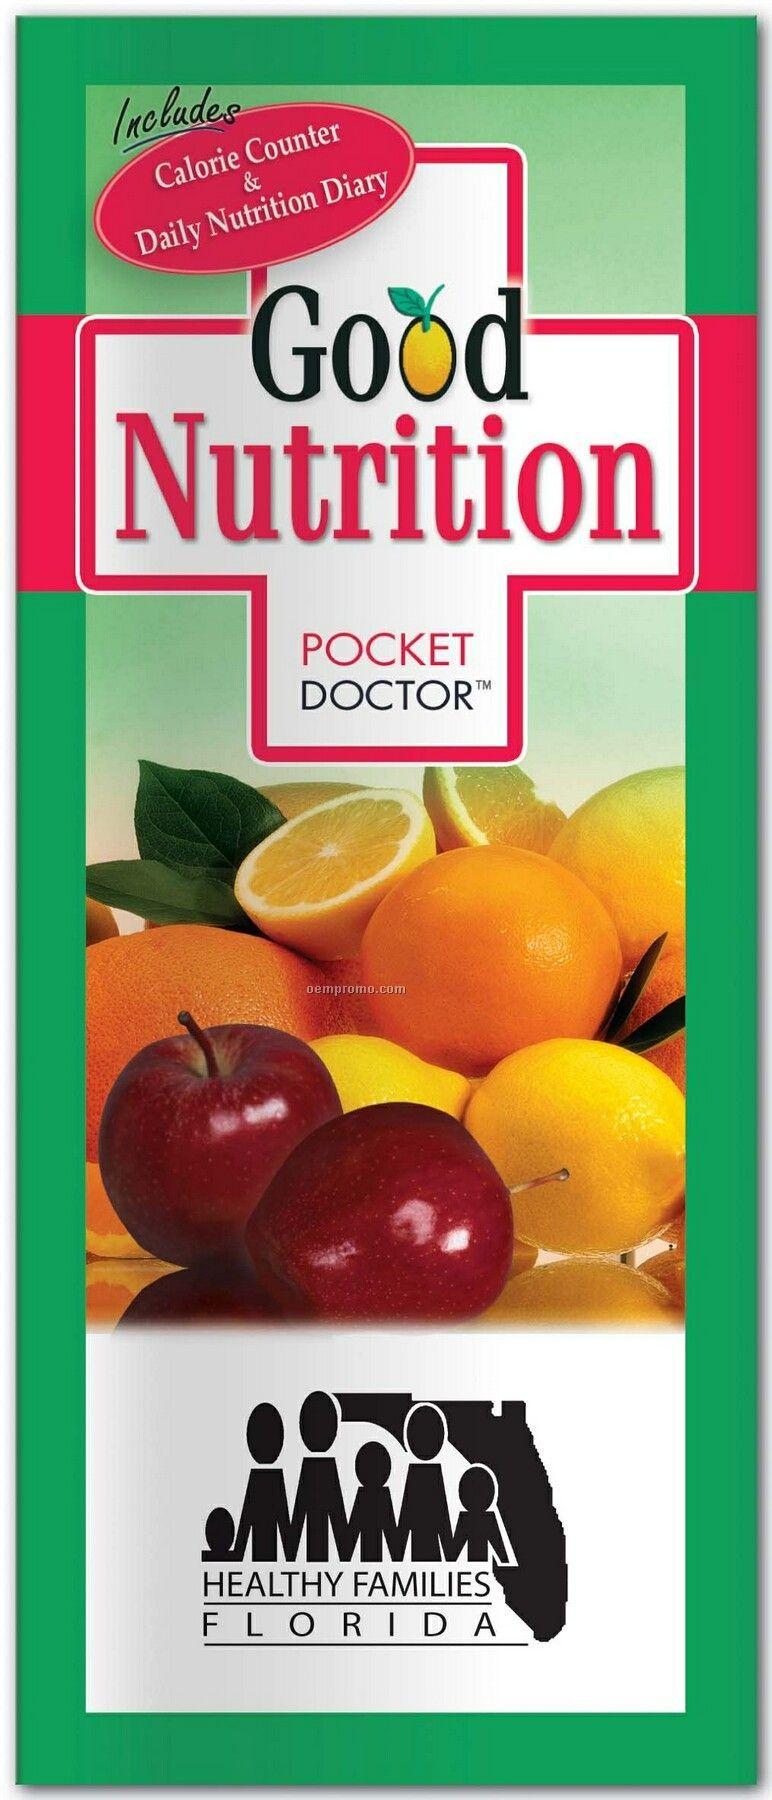 Pillowline Good Nutrition Pocket Doctor Brochure